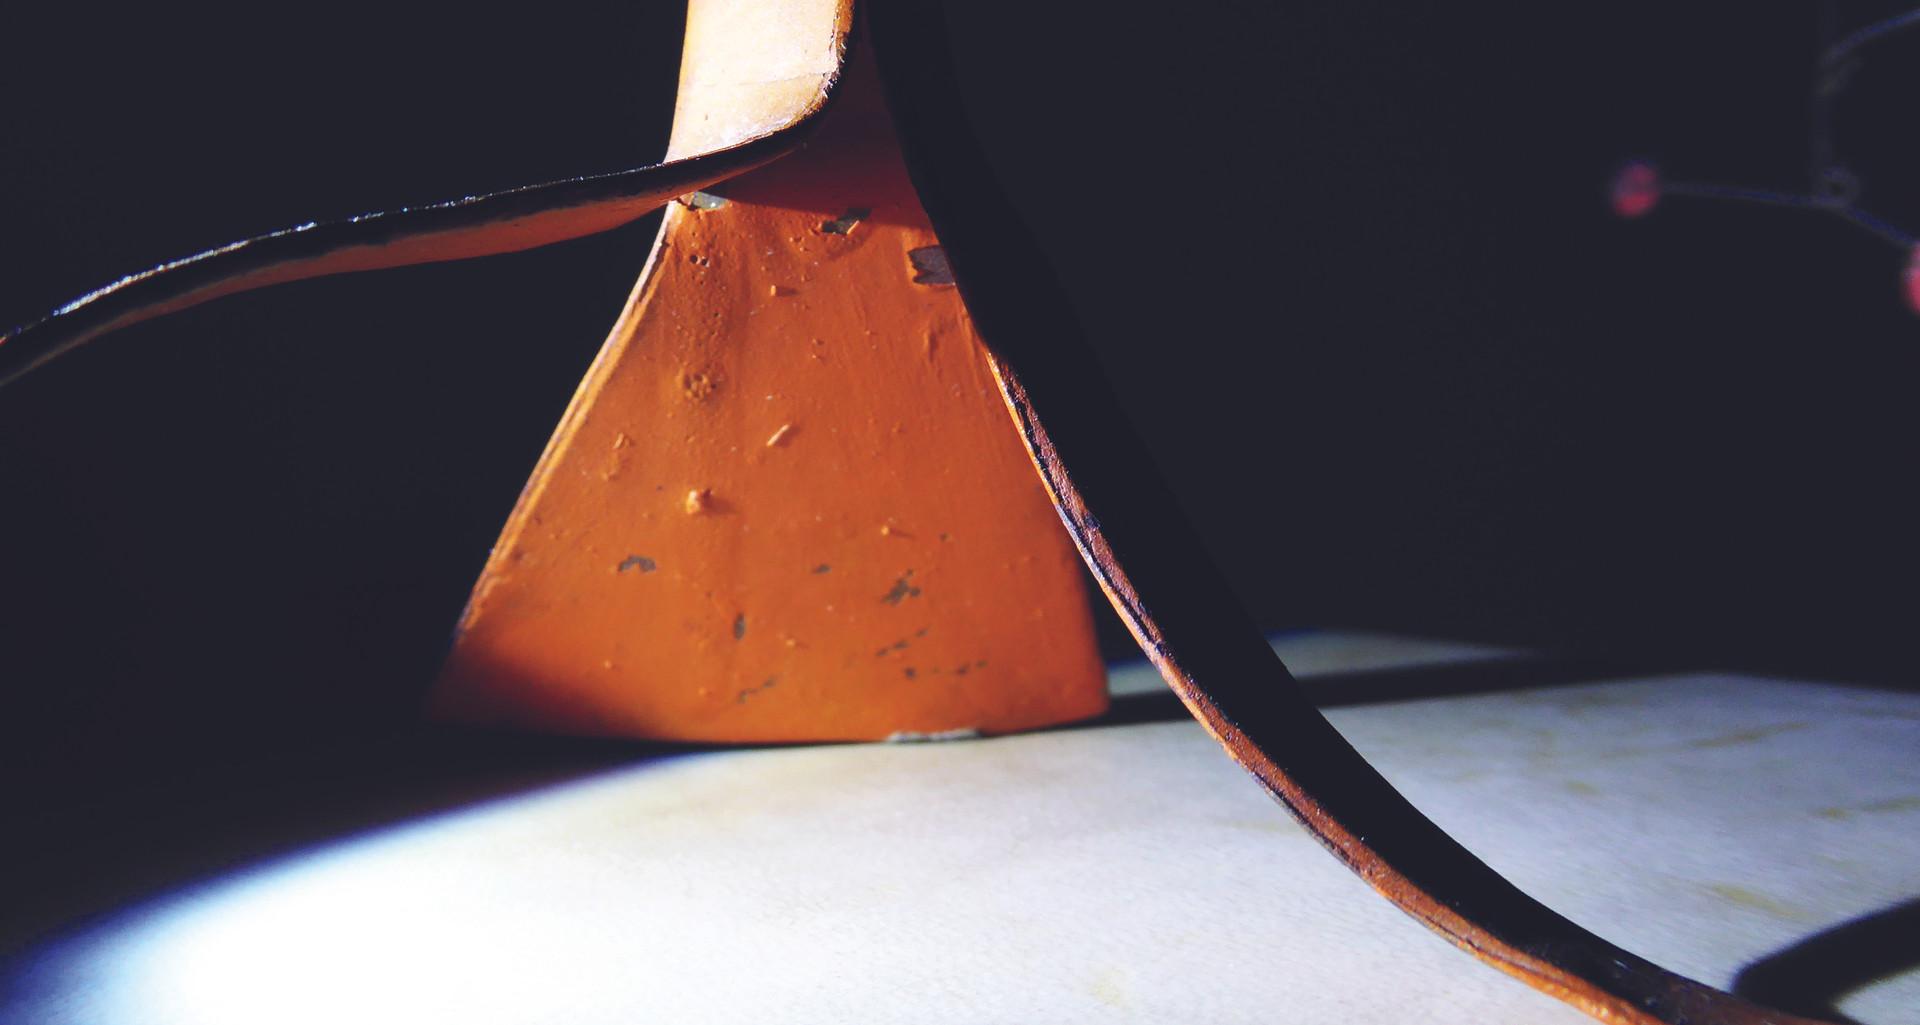 Painted sculpture by Alexander Calder